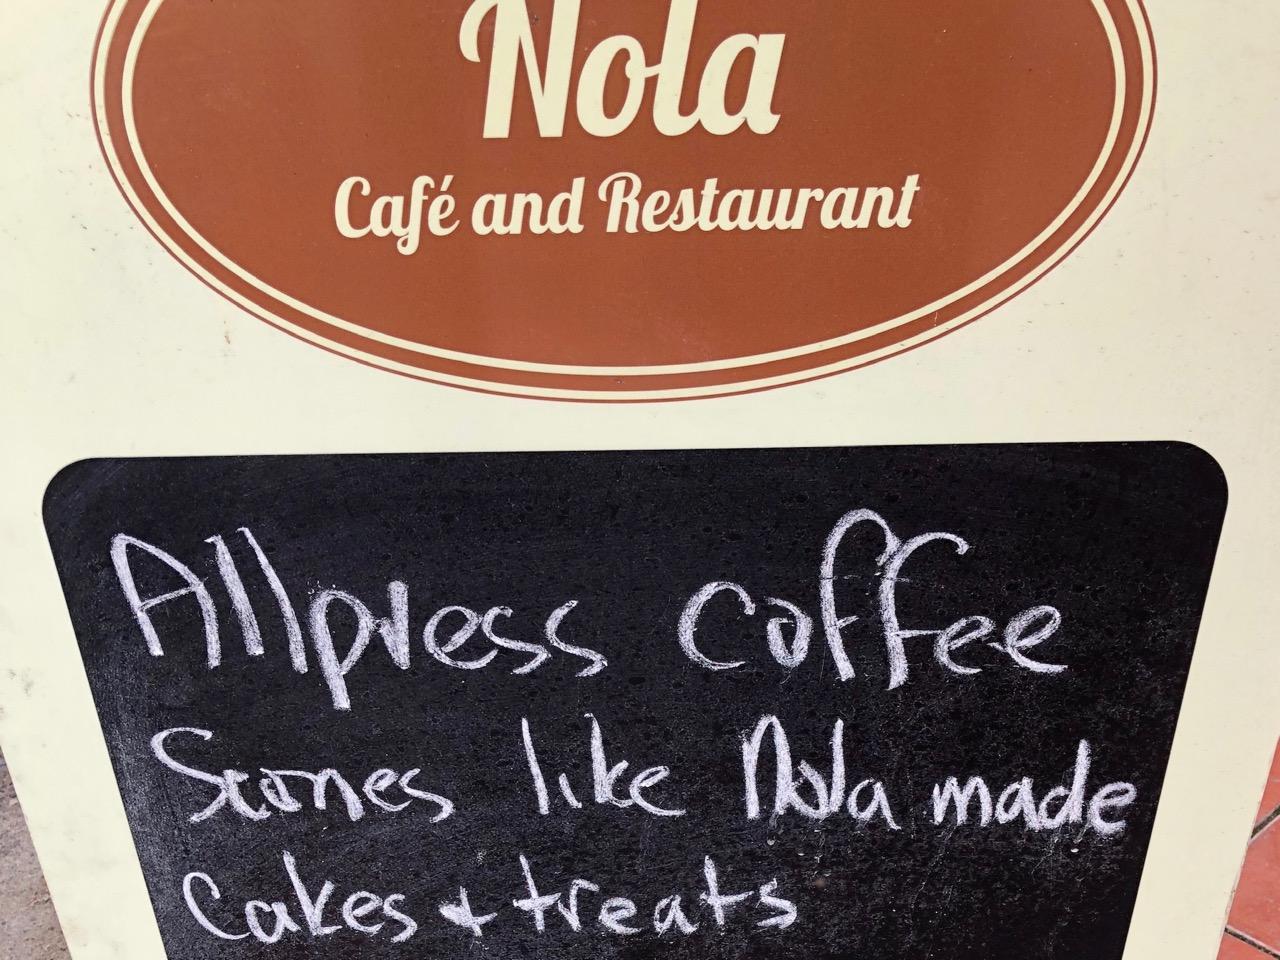 Nola cafe sign